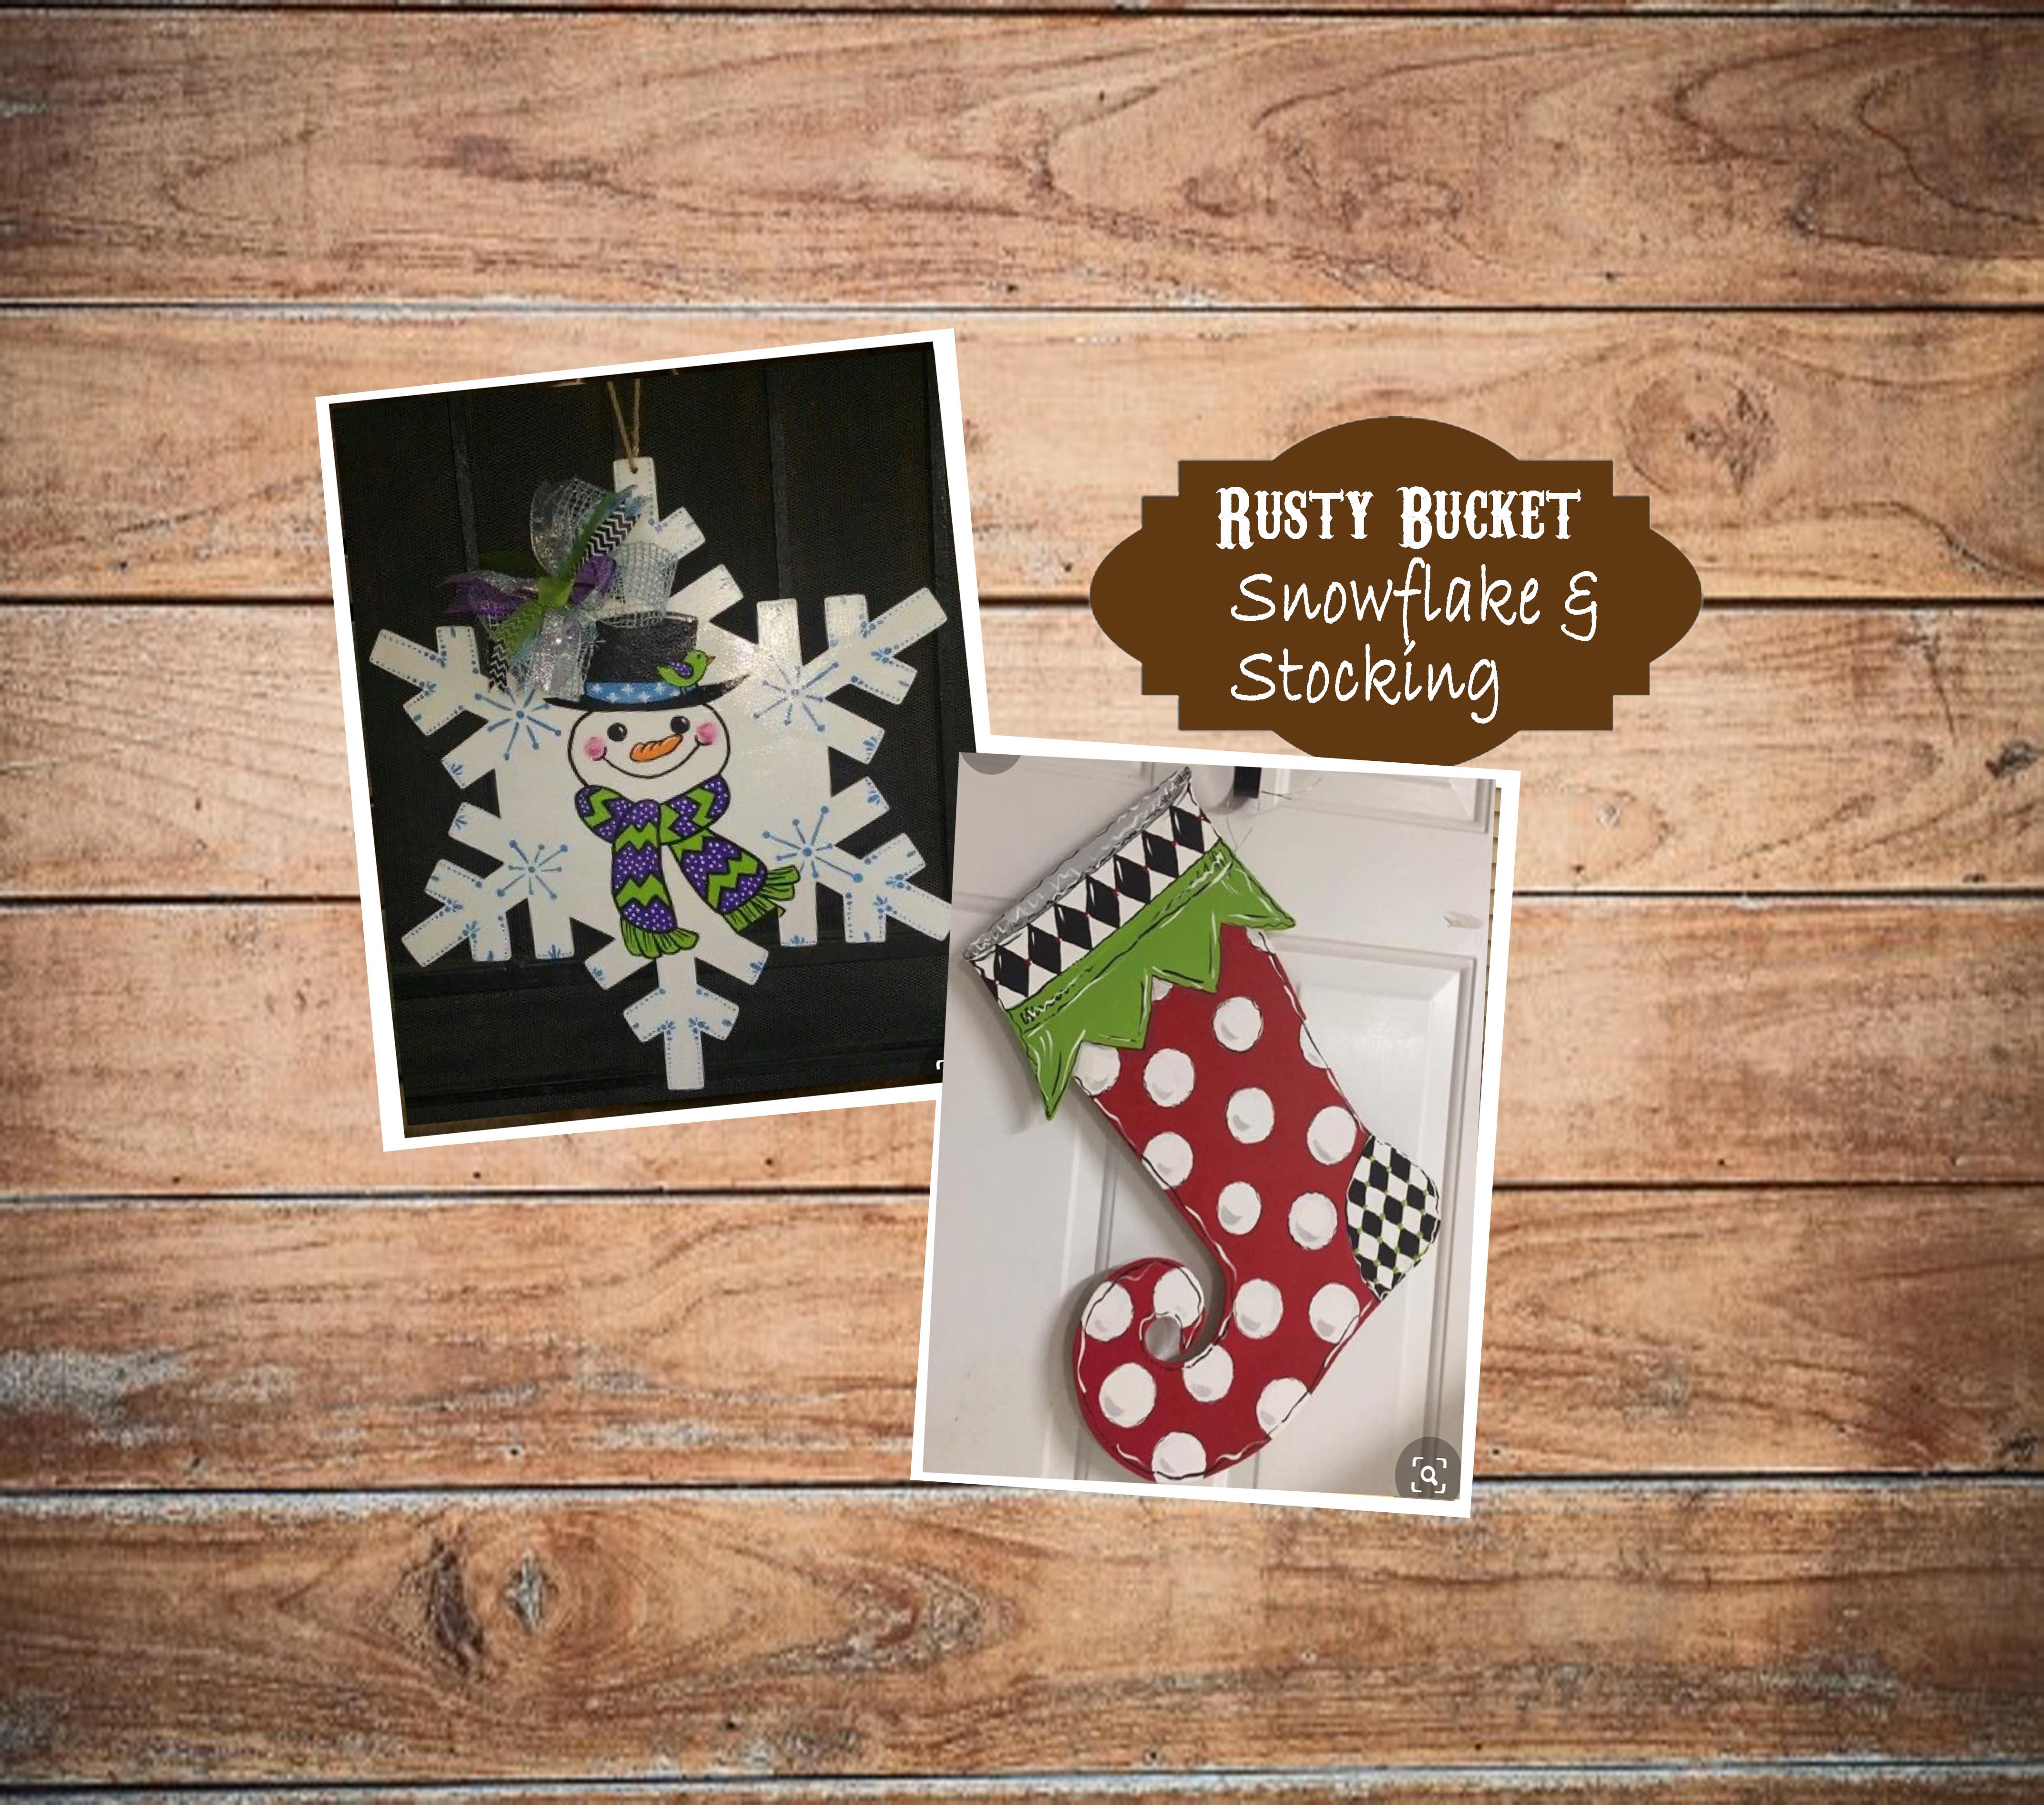 Snowflake & Stocking Workshop | Dec 10